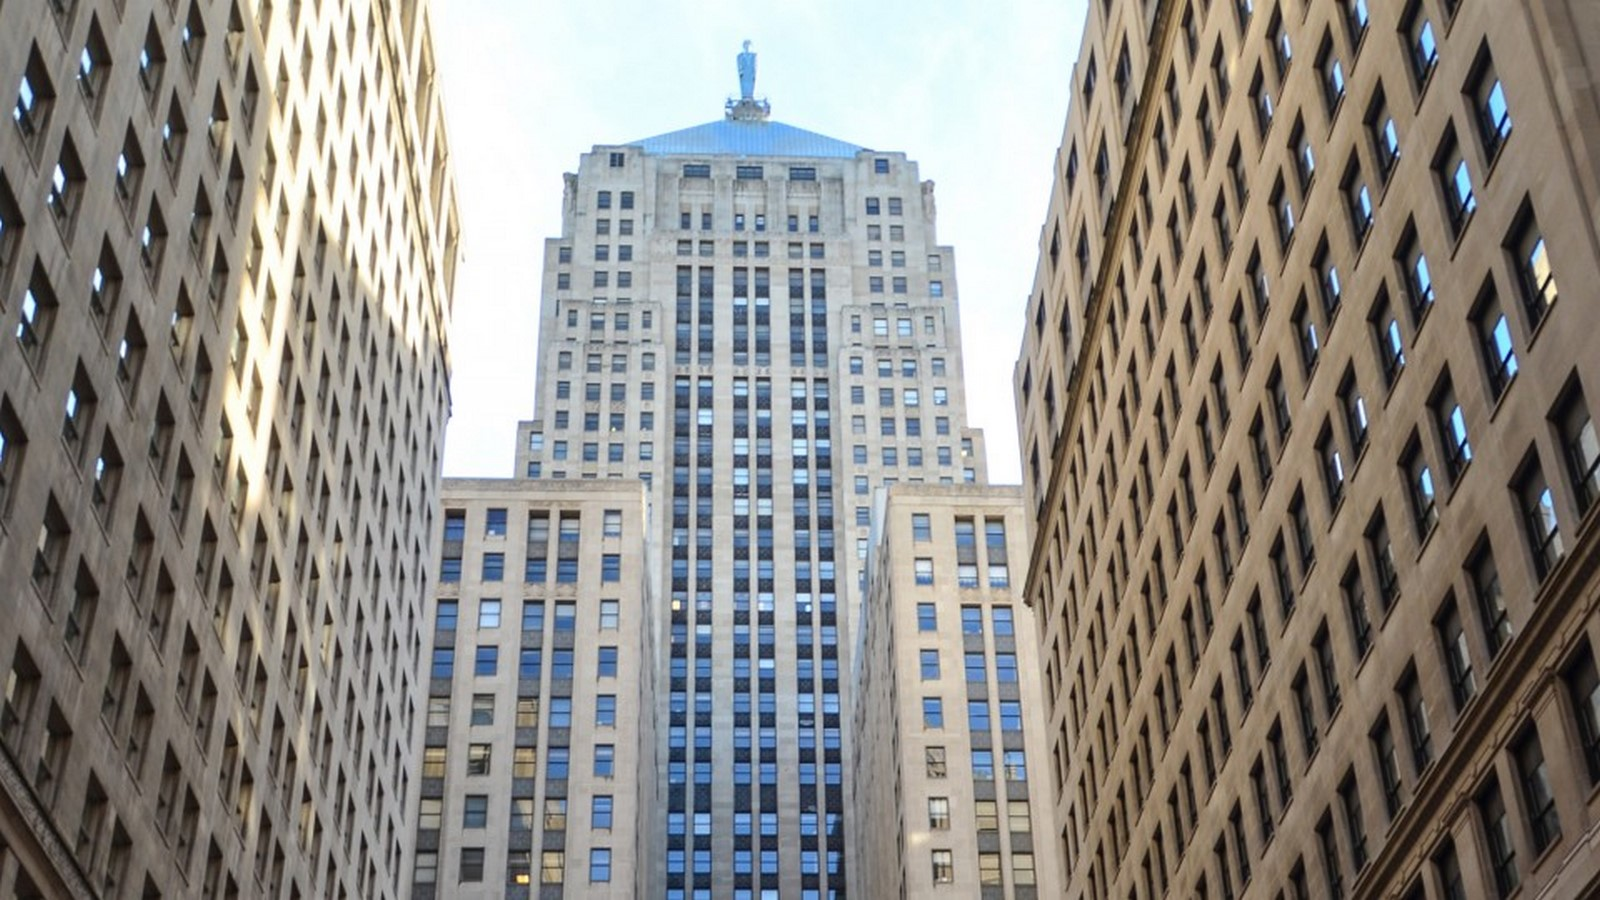 15 popular Art Deco building around the world - Sheet1